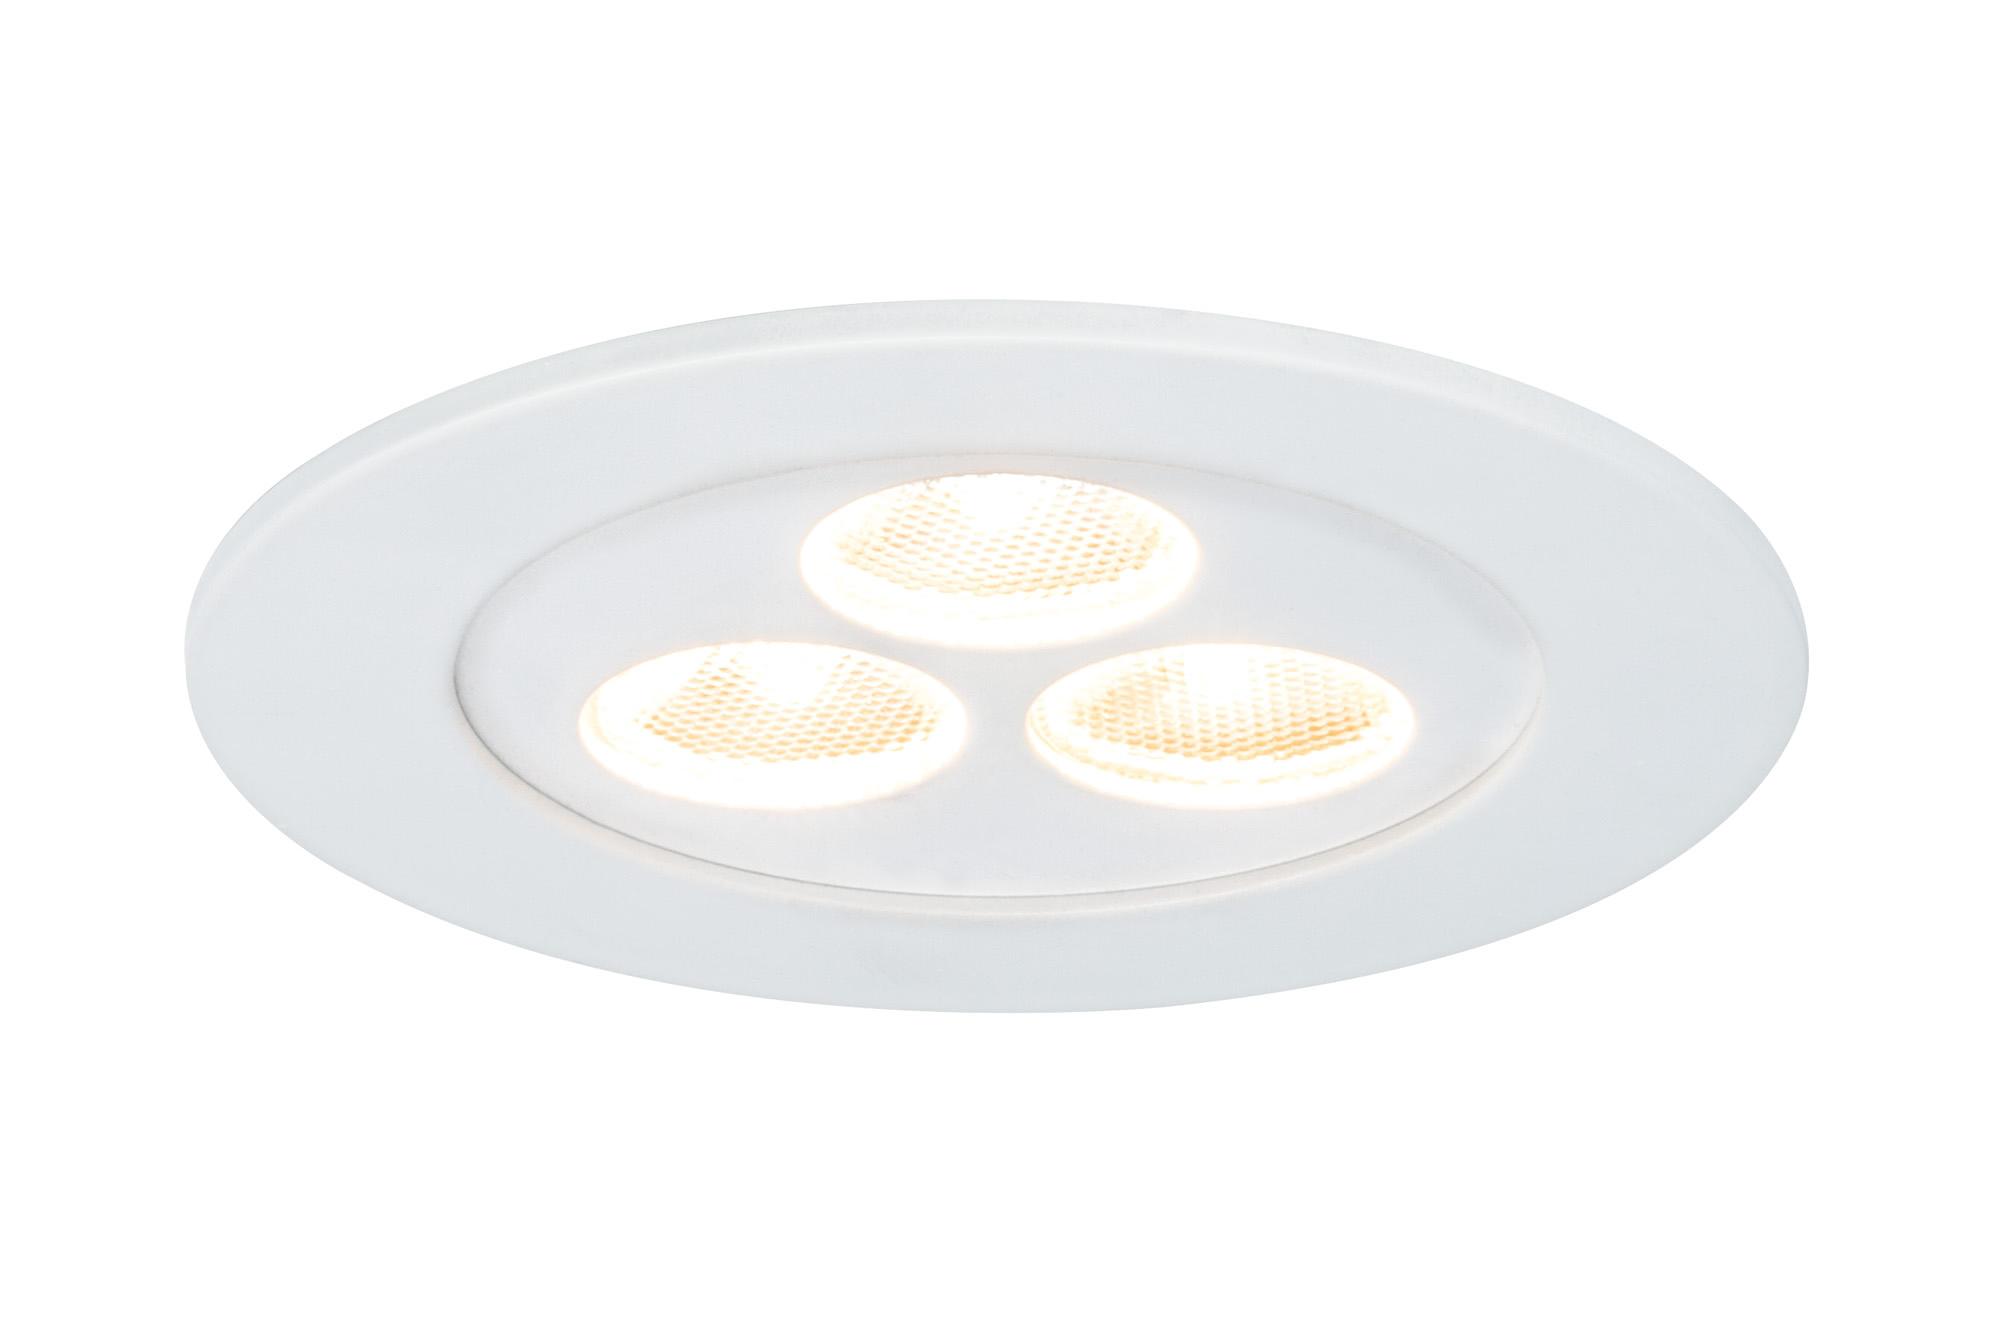 Paulmann. 92588 Светильник мебельный Flat LED 1x3,6W, 350mA, белый